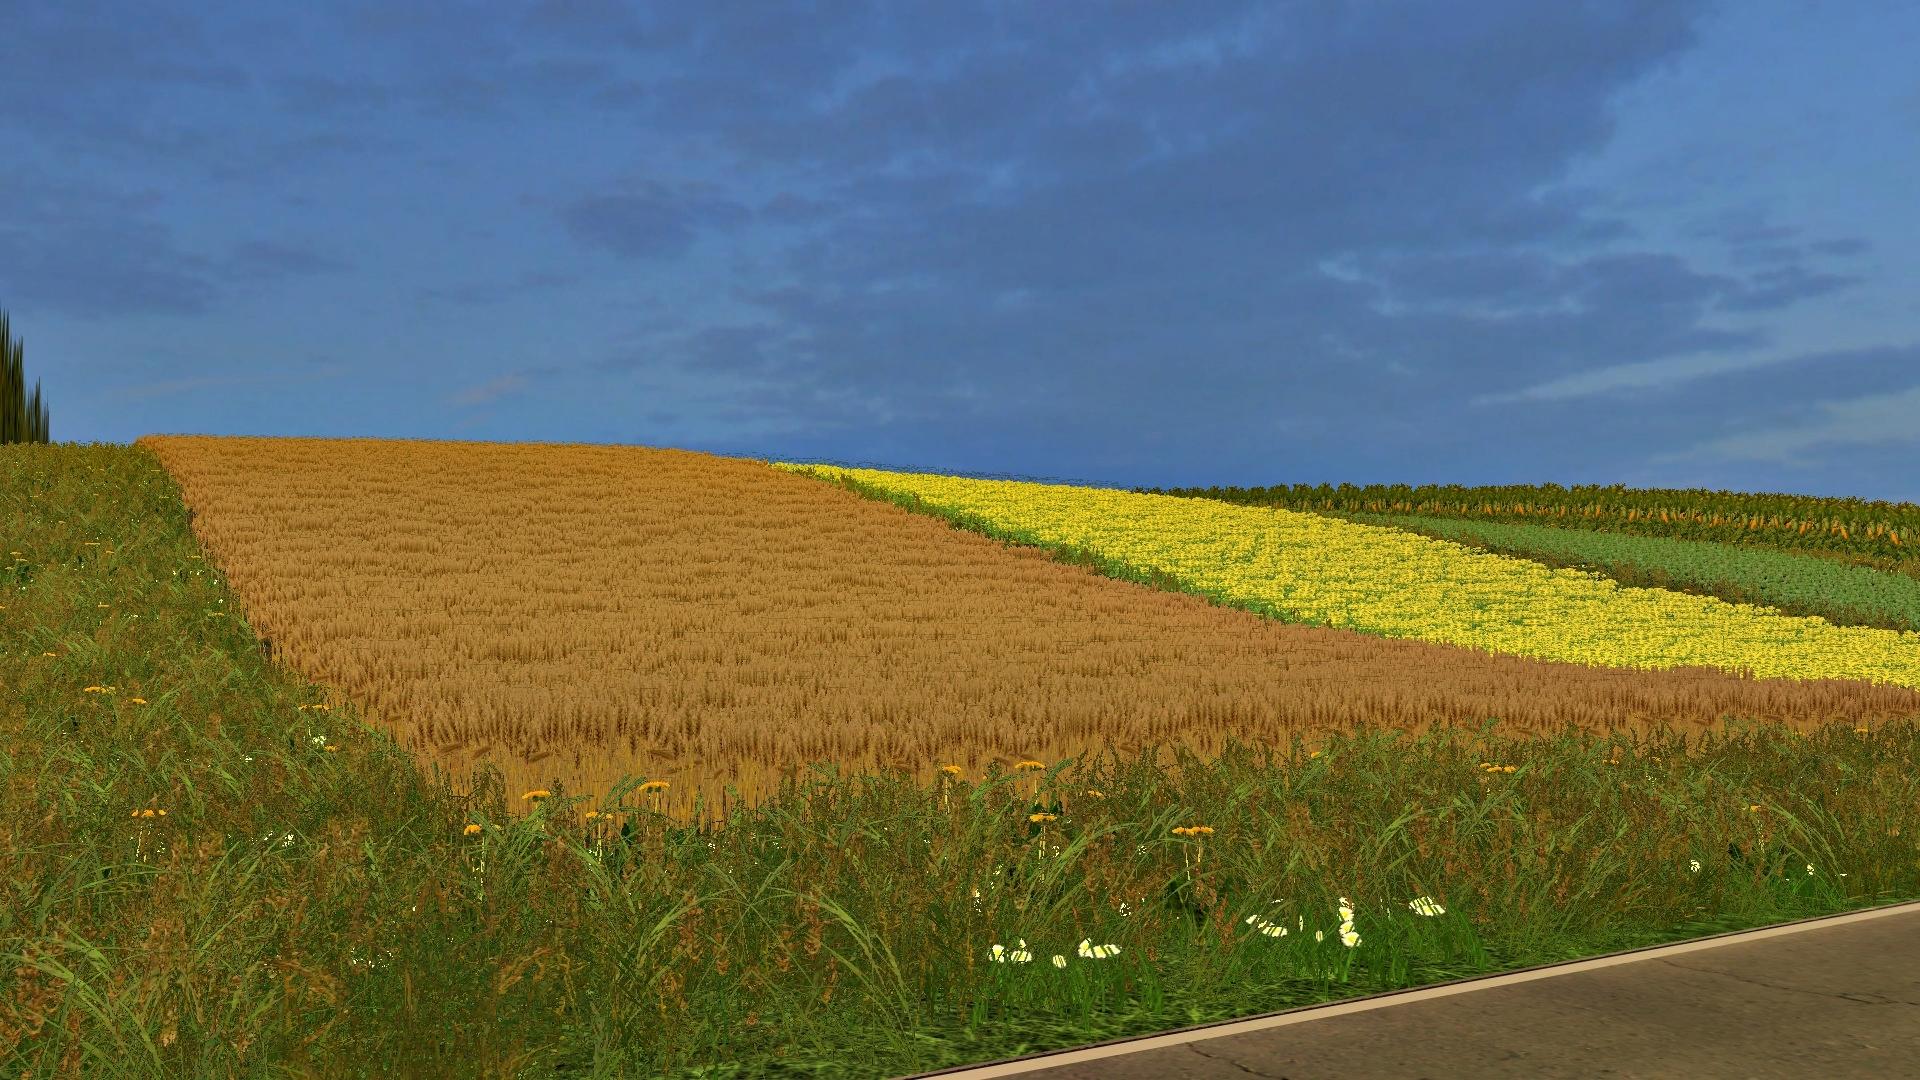 http://abload.de/img/farmingsimulator2013gthk97.jpg